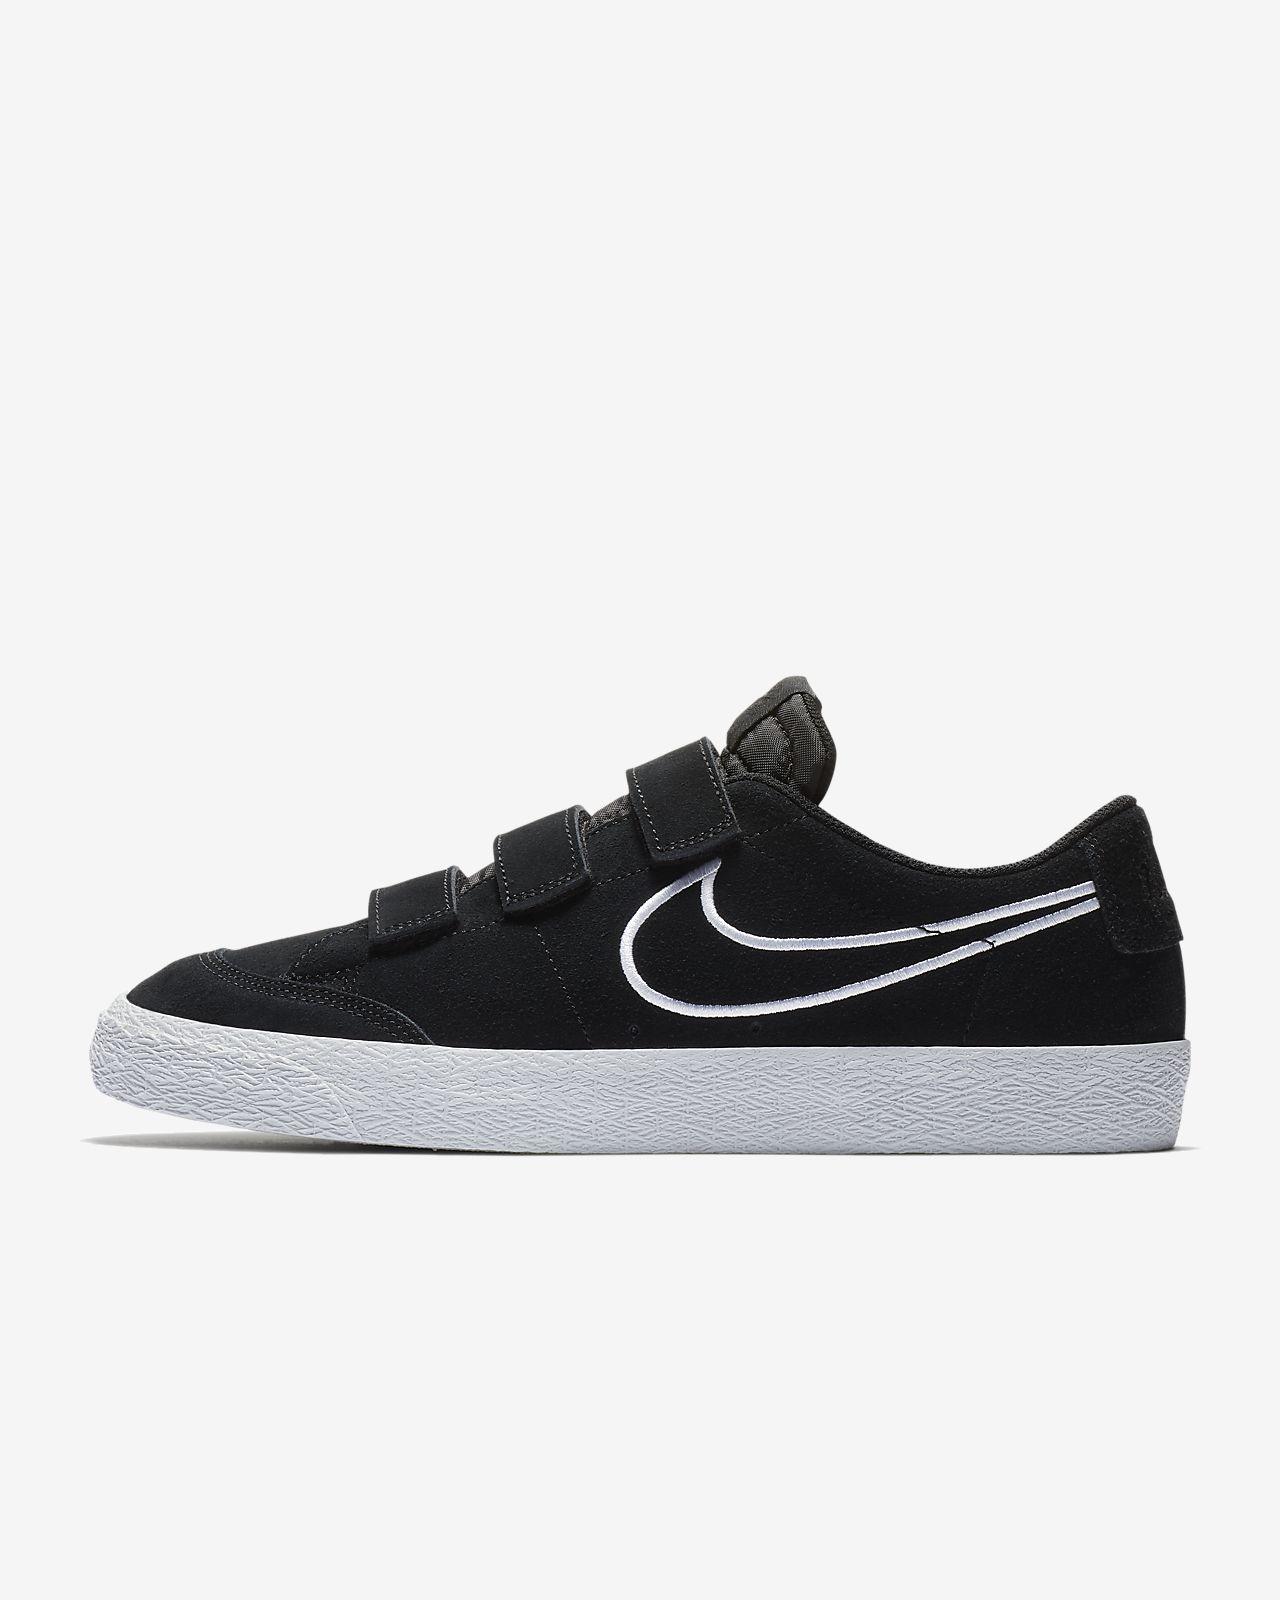 Nike SB Zoom Blazer Men AC XT Ridgerock Fossil Men Blazer Skate Boarding Shoes AH3434200 dcb69b